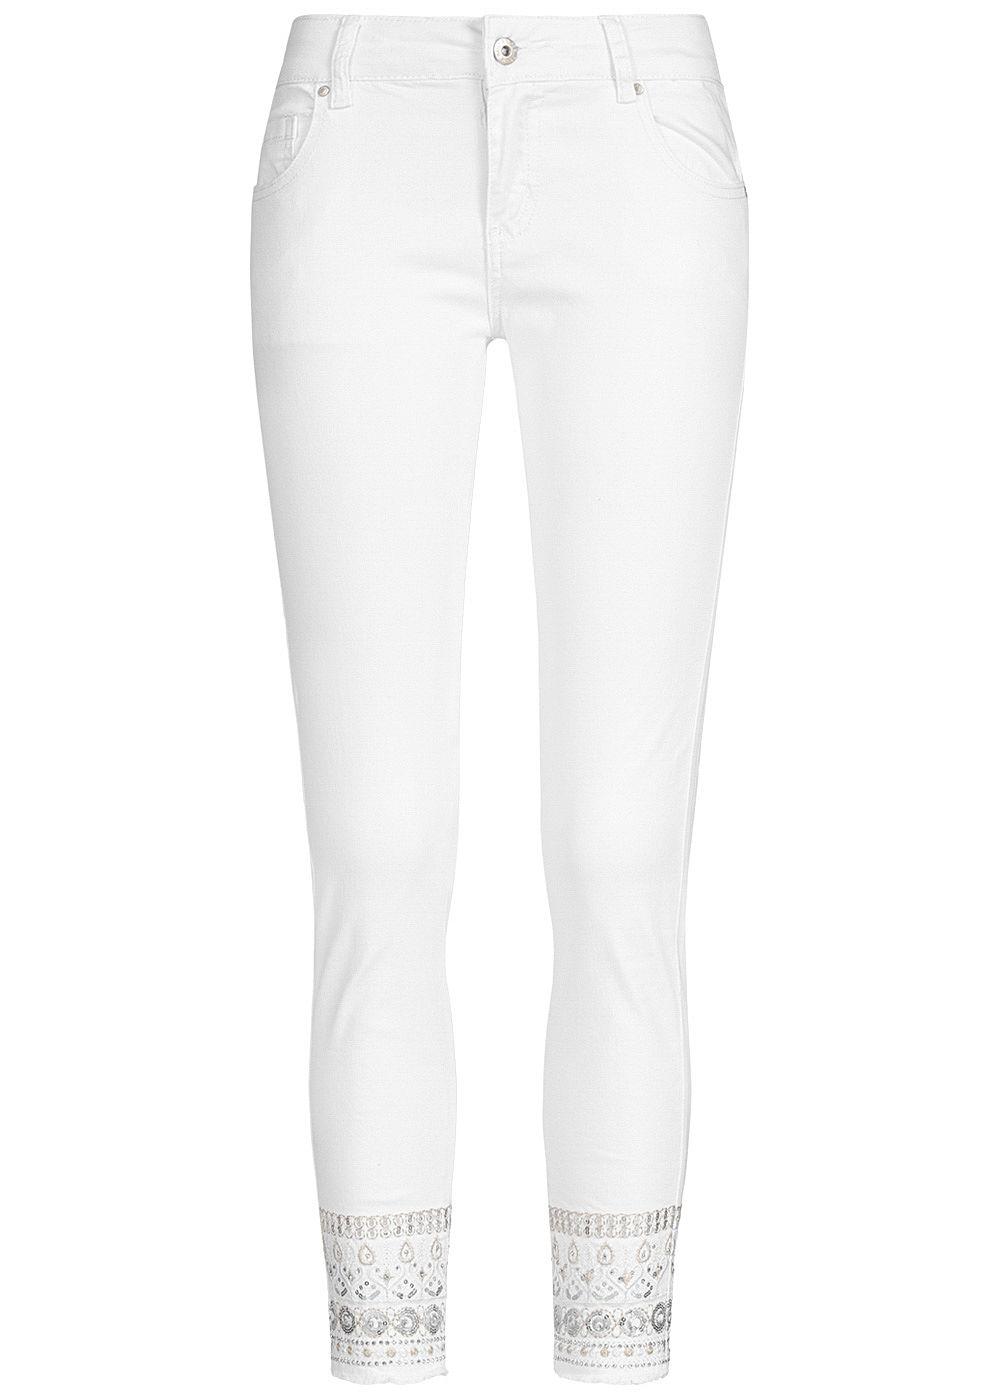 Hailys Damen Ankle Jeans Hose Mid Waist 5 Pockets Fransen